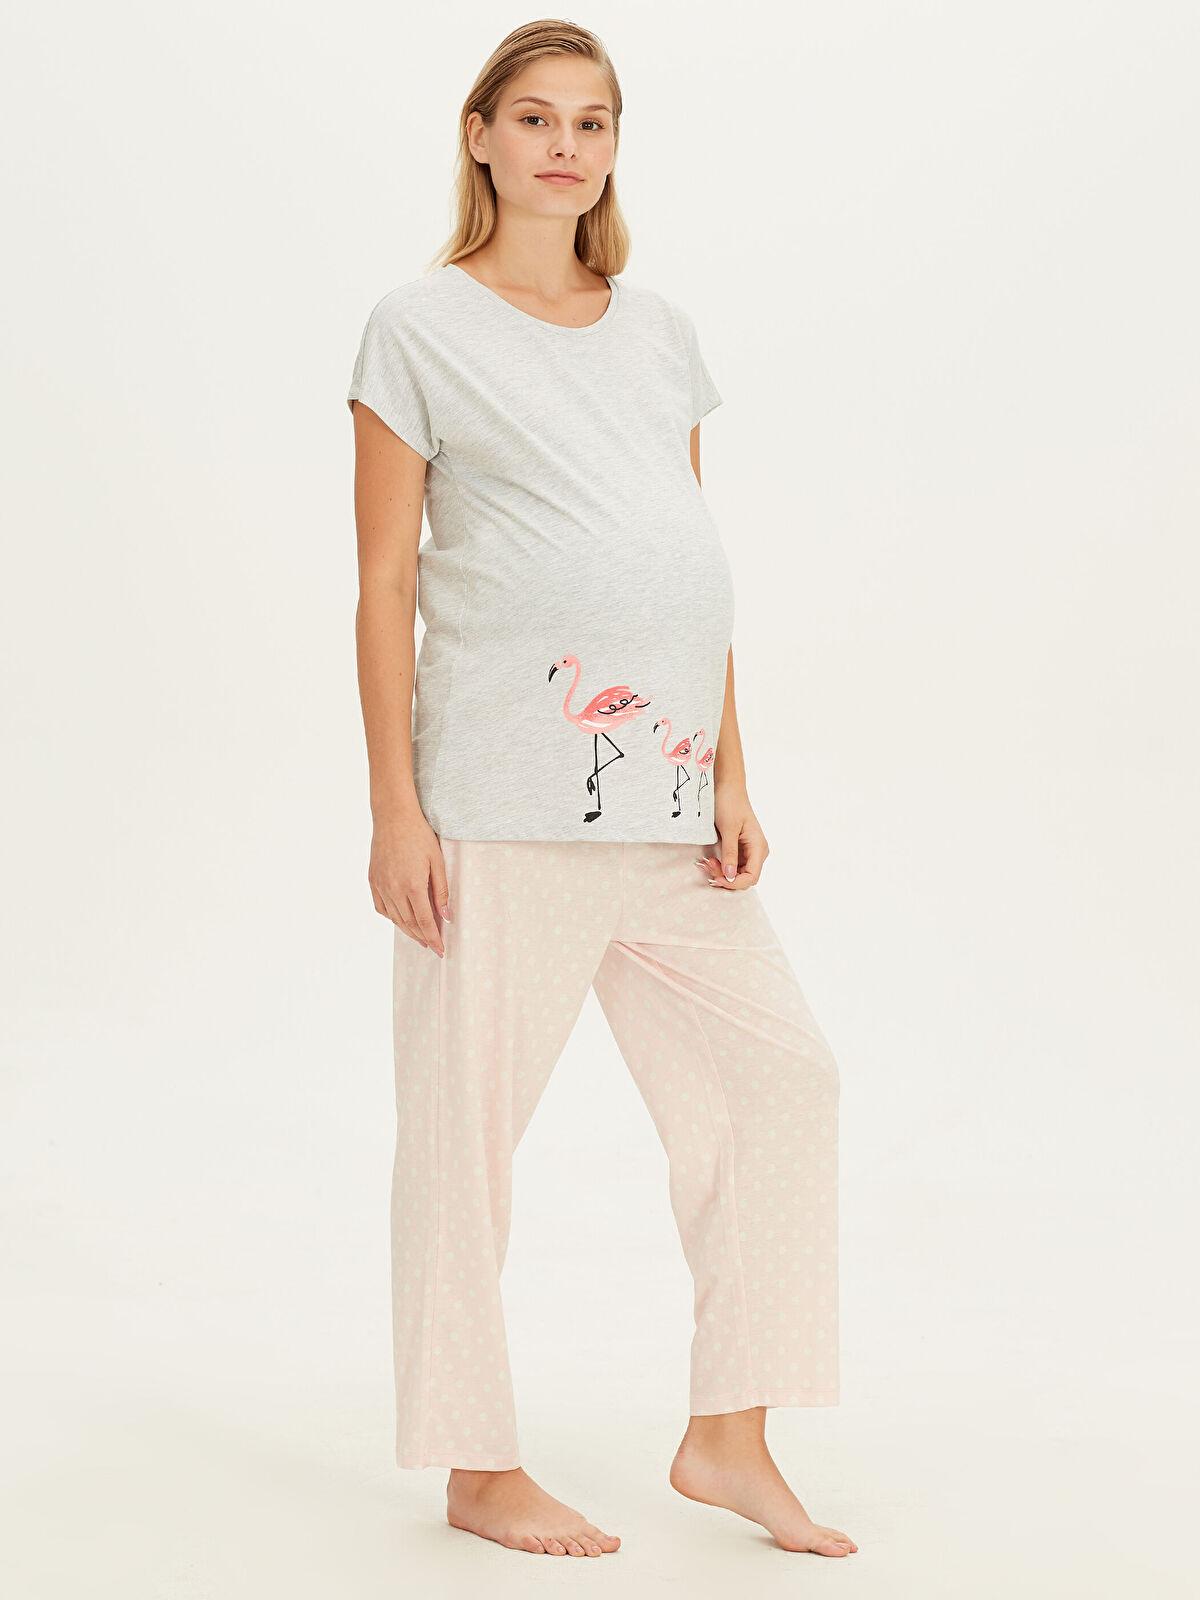 Flamingo Desenli Hamile Pijama Takımı - LC WAIKIKI